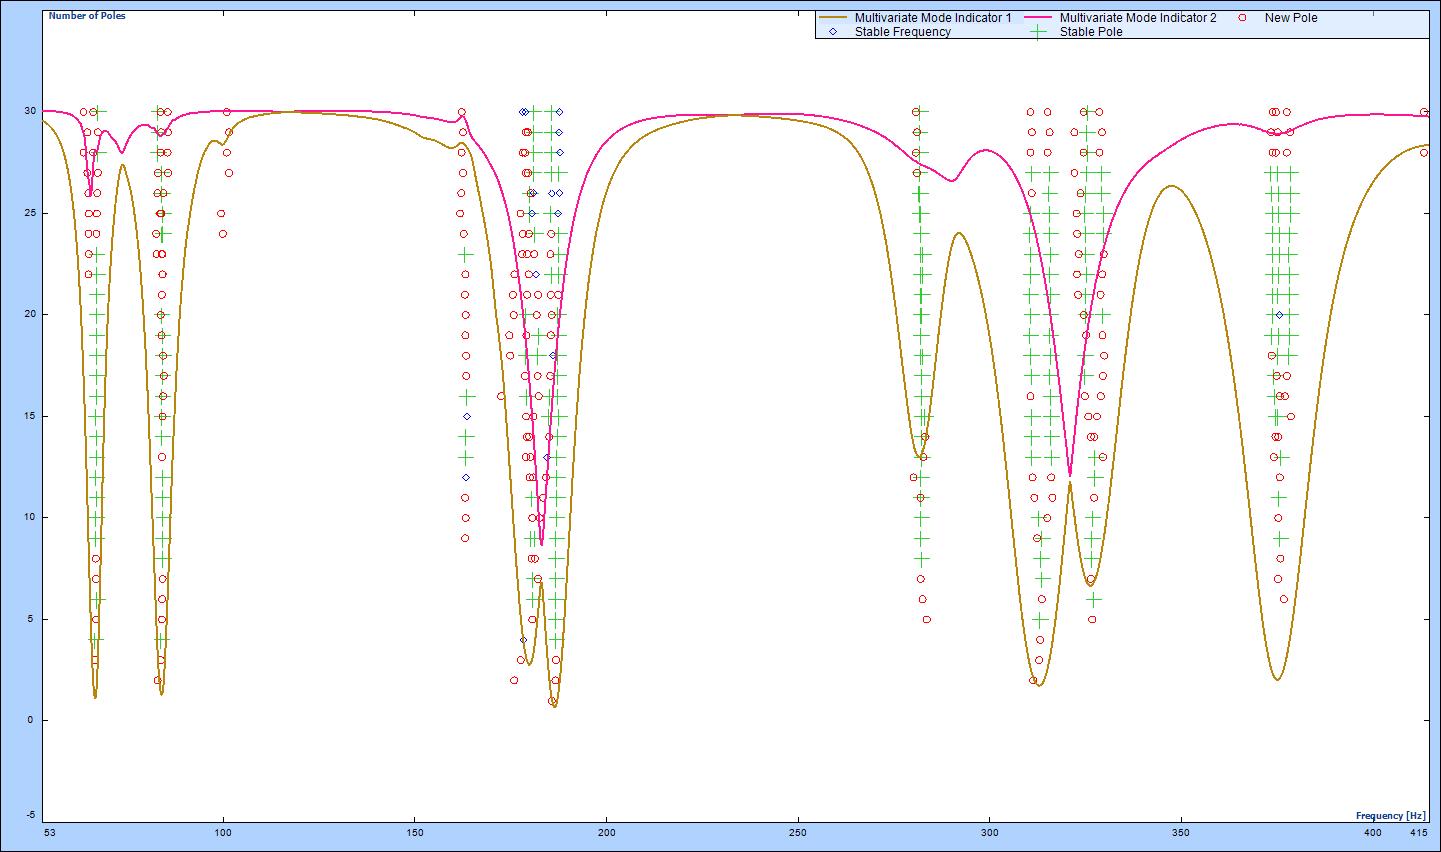 Figure 3.4: Stability diagram using Poly-X estimator